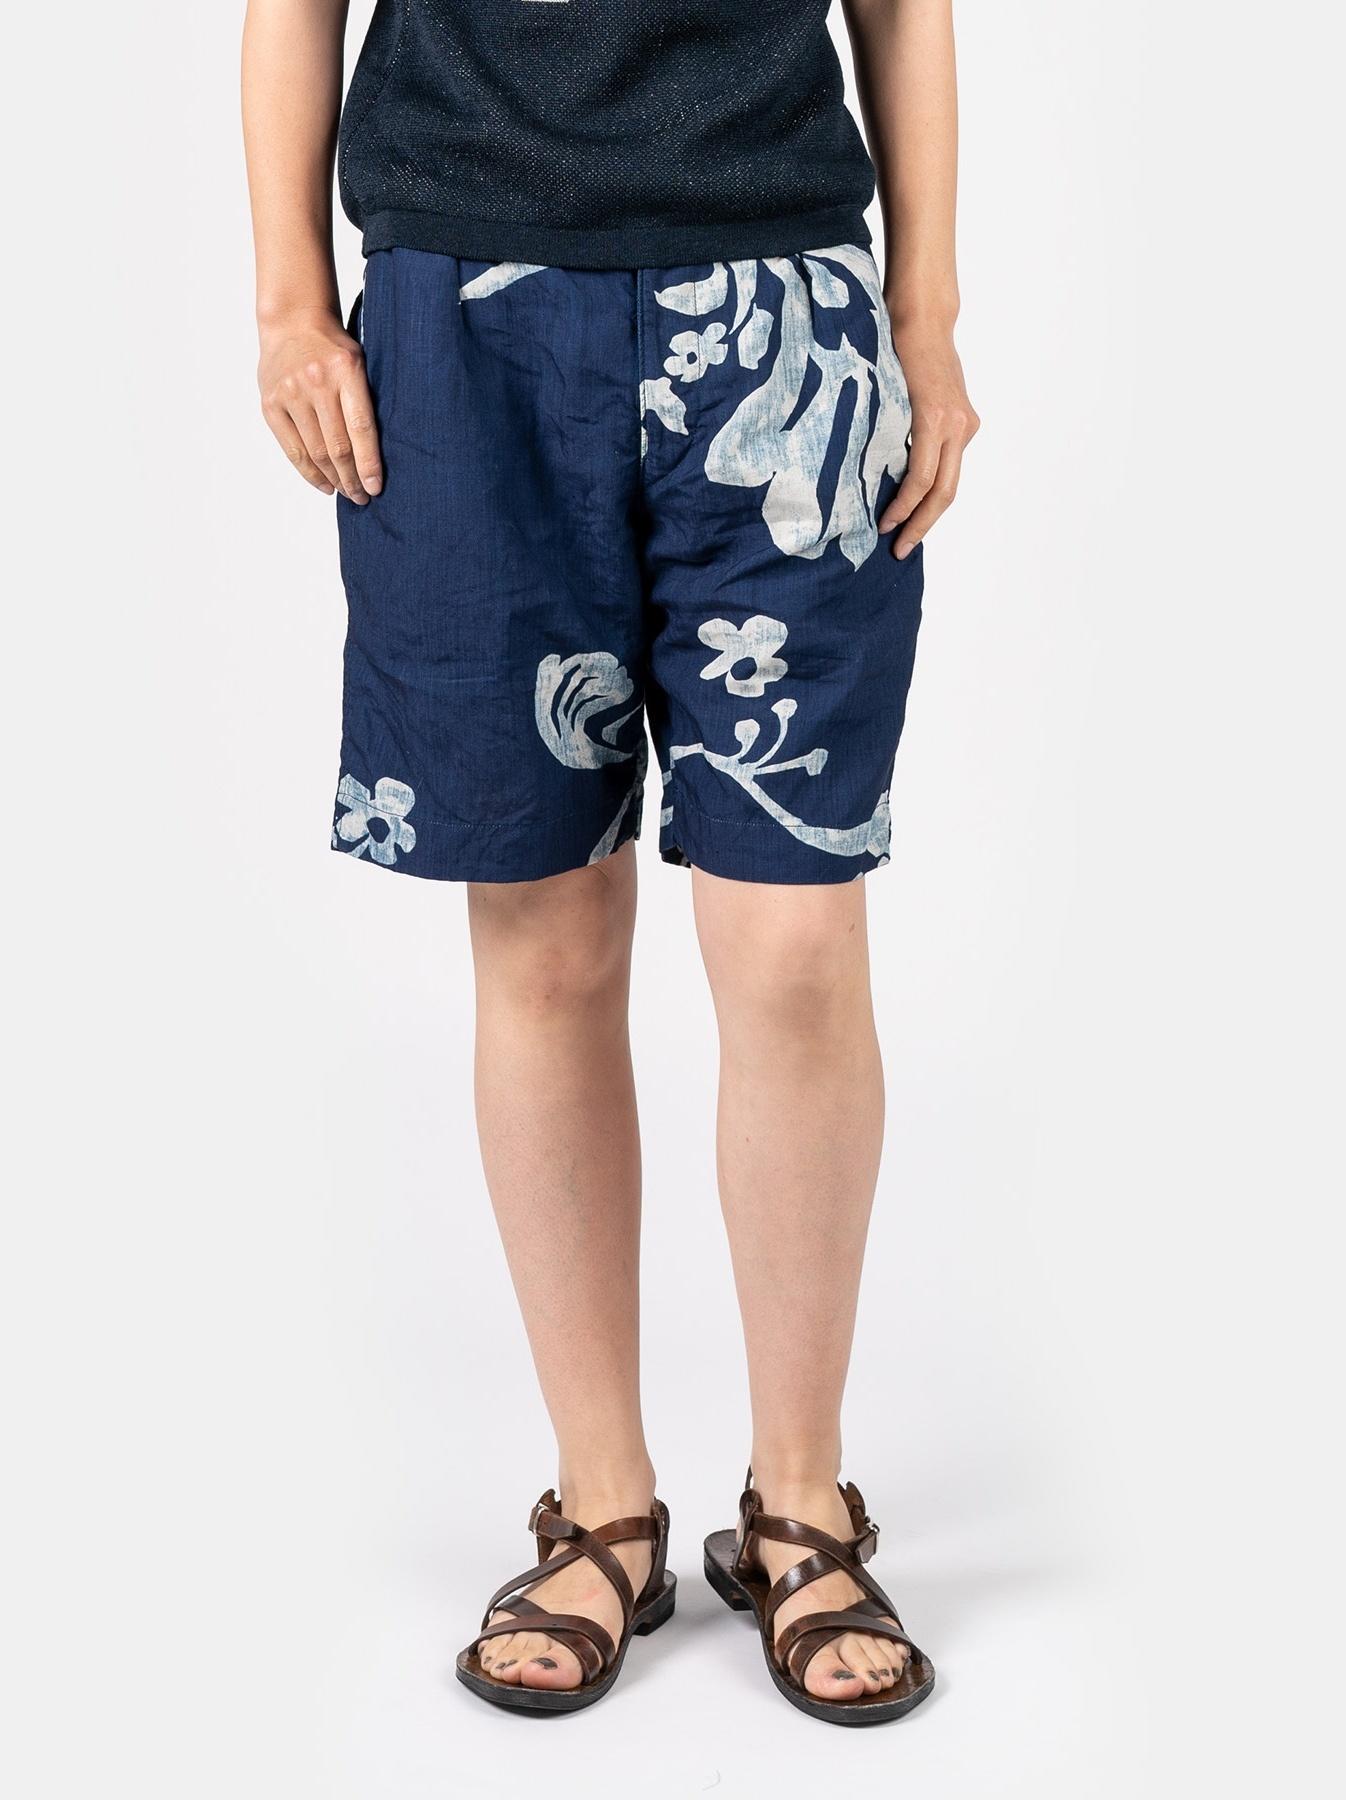 WH Indigo Linen Umiiloha 908 Short Pants-7